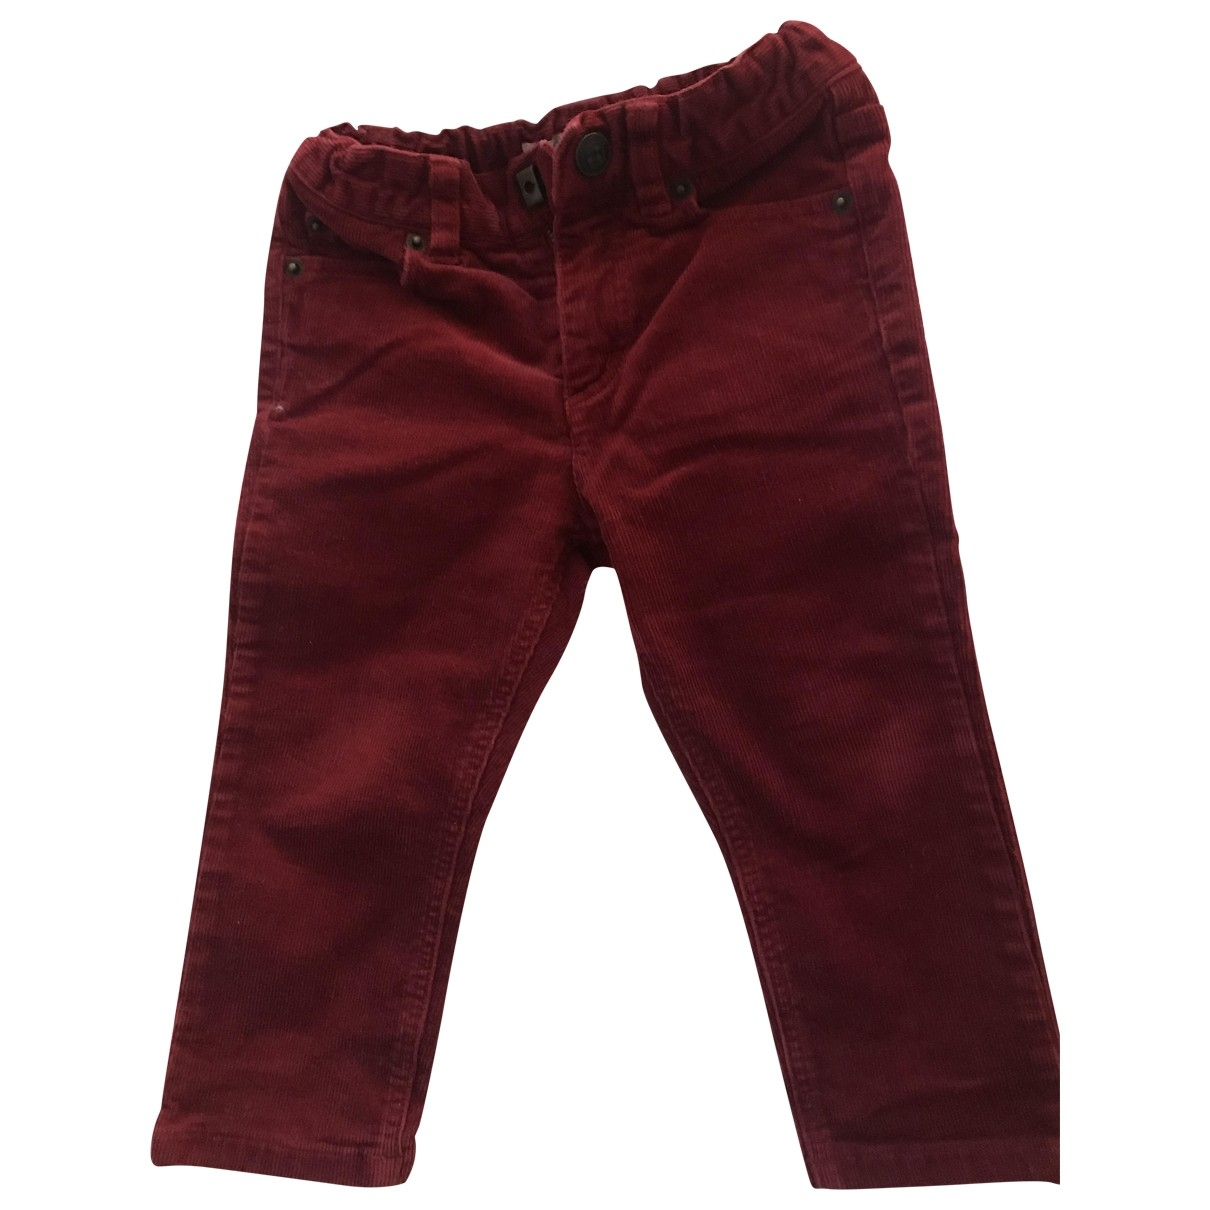 Bonpoint \N Red Velvet Trousers for Kids 18 months - up to 81cm FR